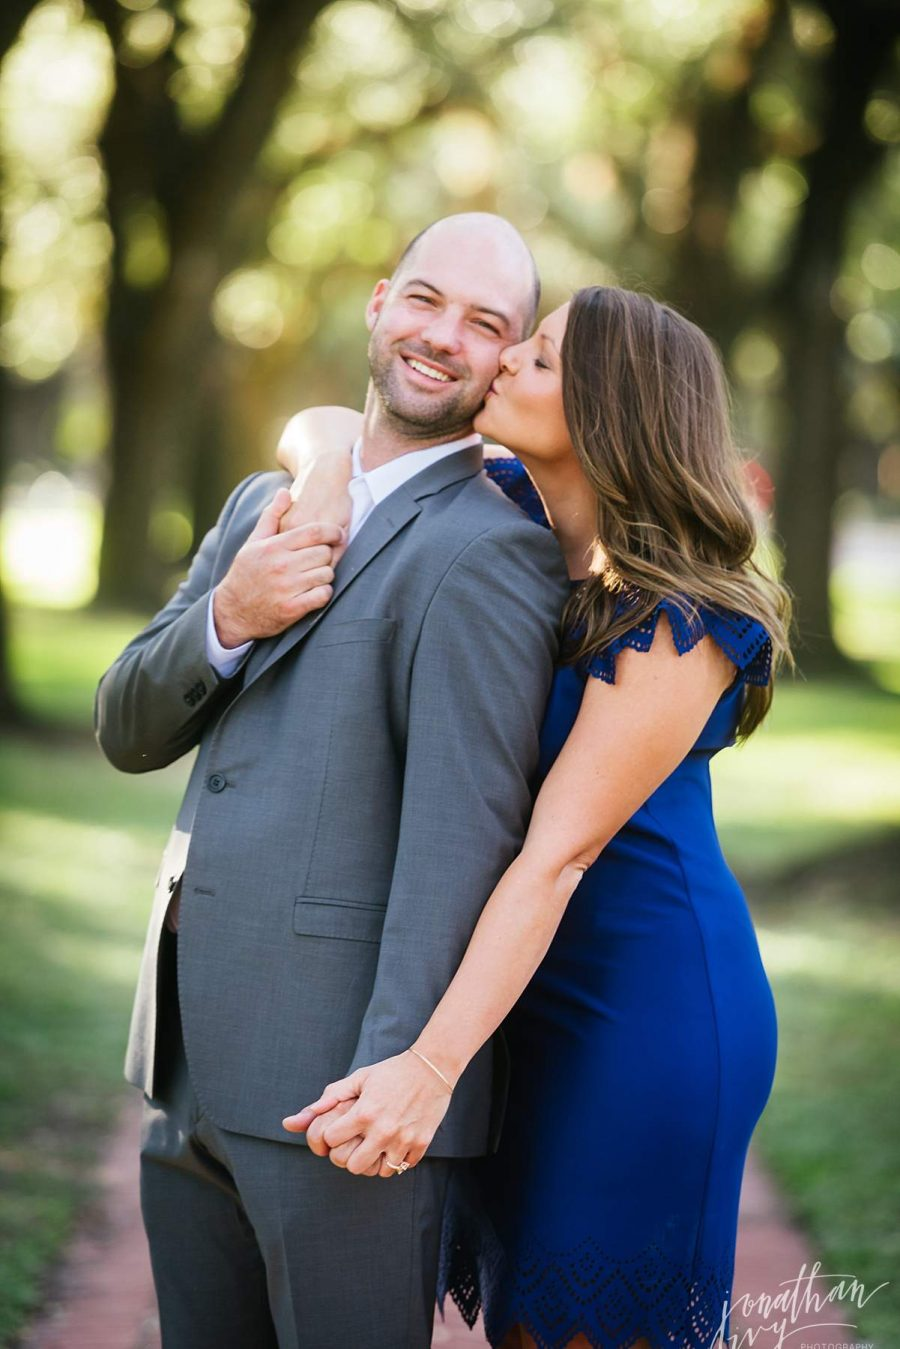 Couples Engagement Pose Ideas